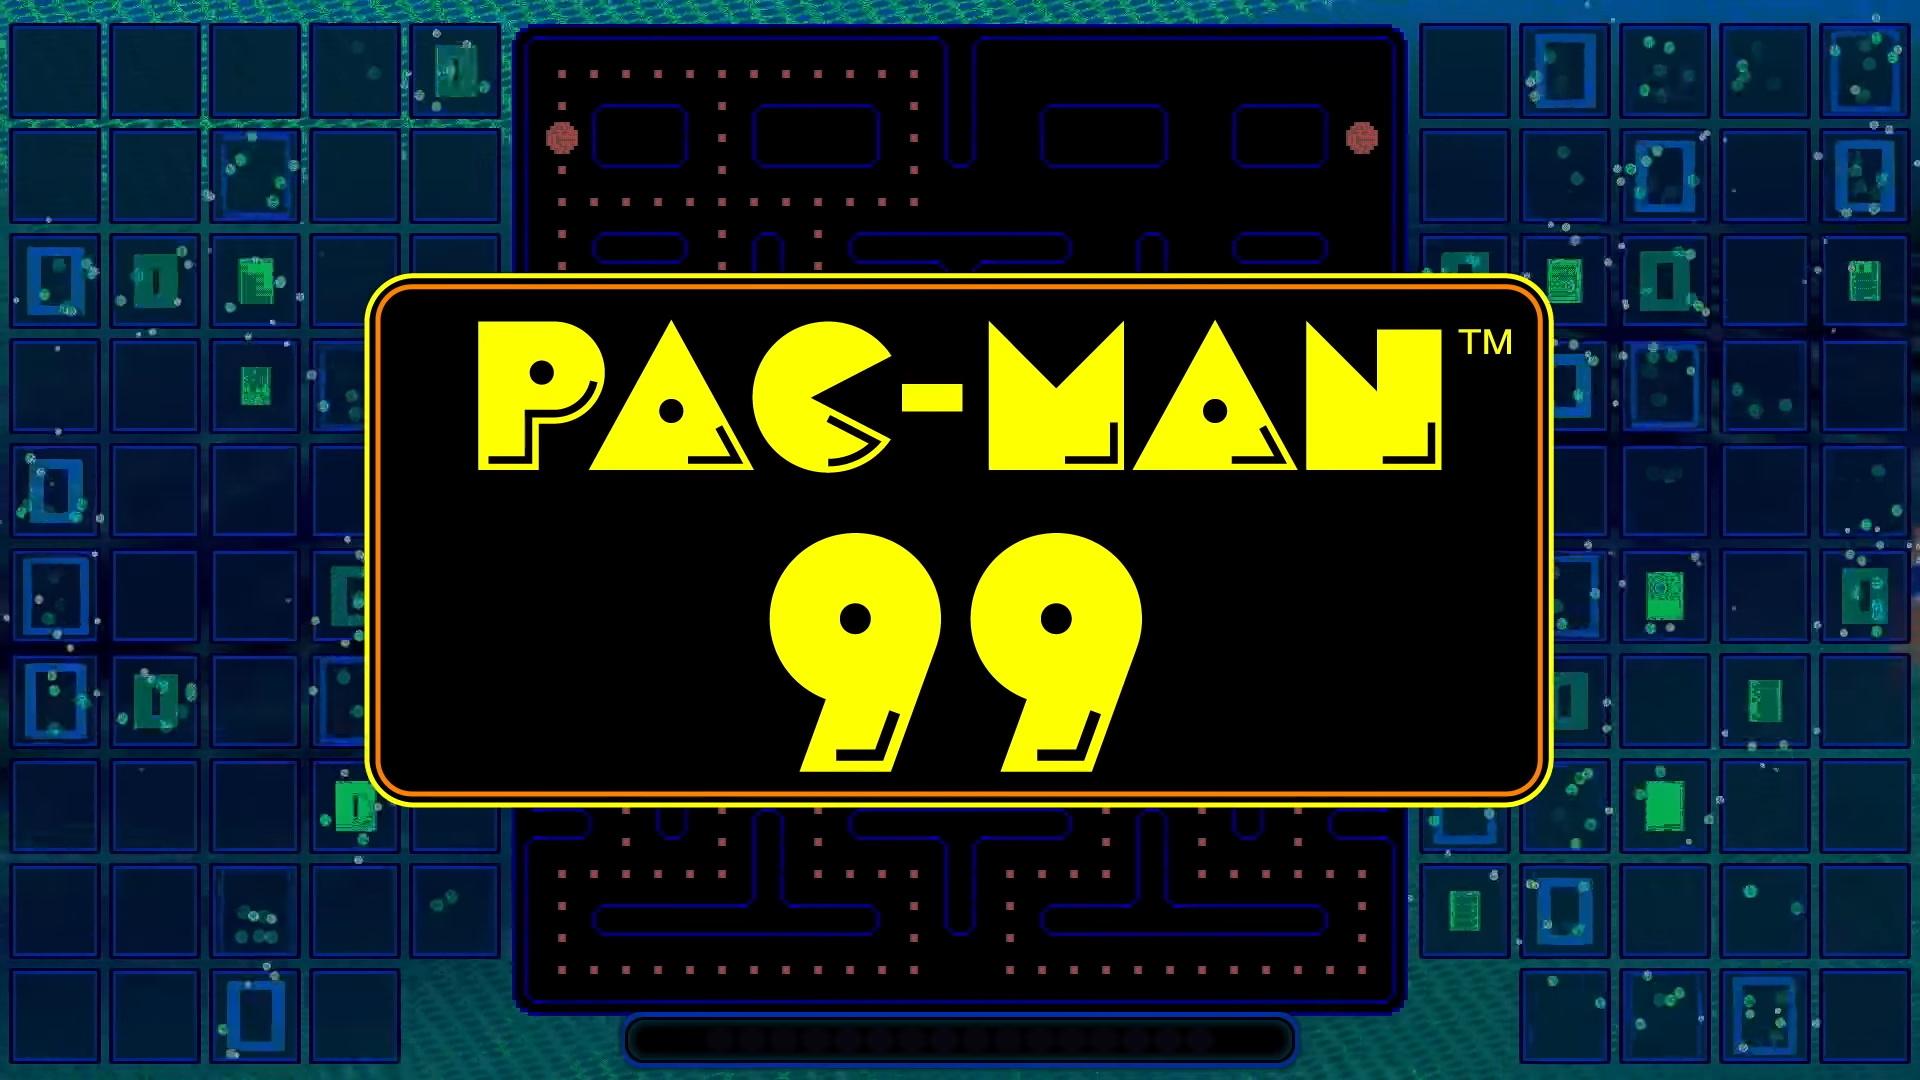 Bandai Namco анонсировала королевскую битву Pac-Man99 для Switch